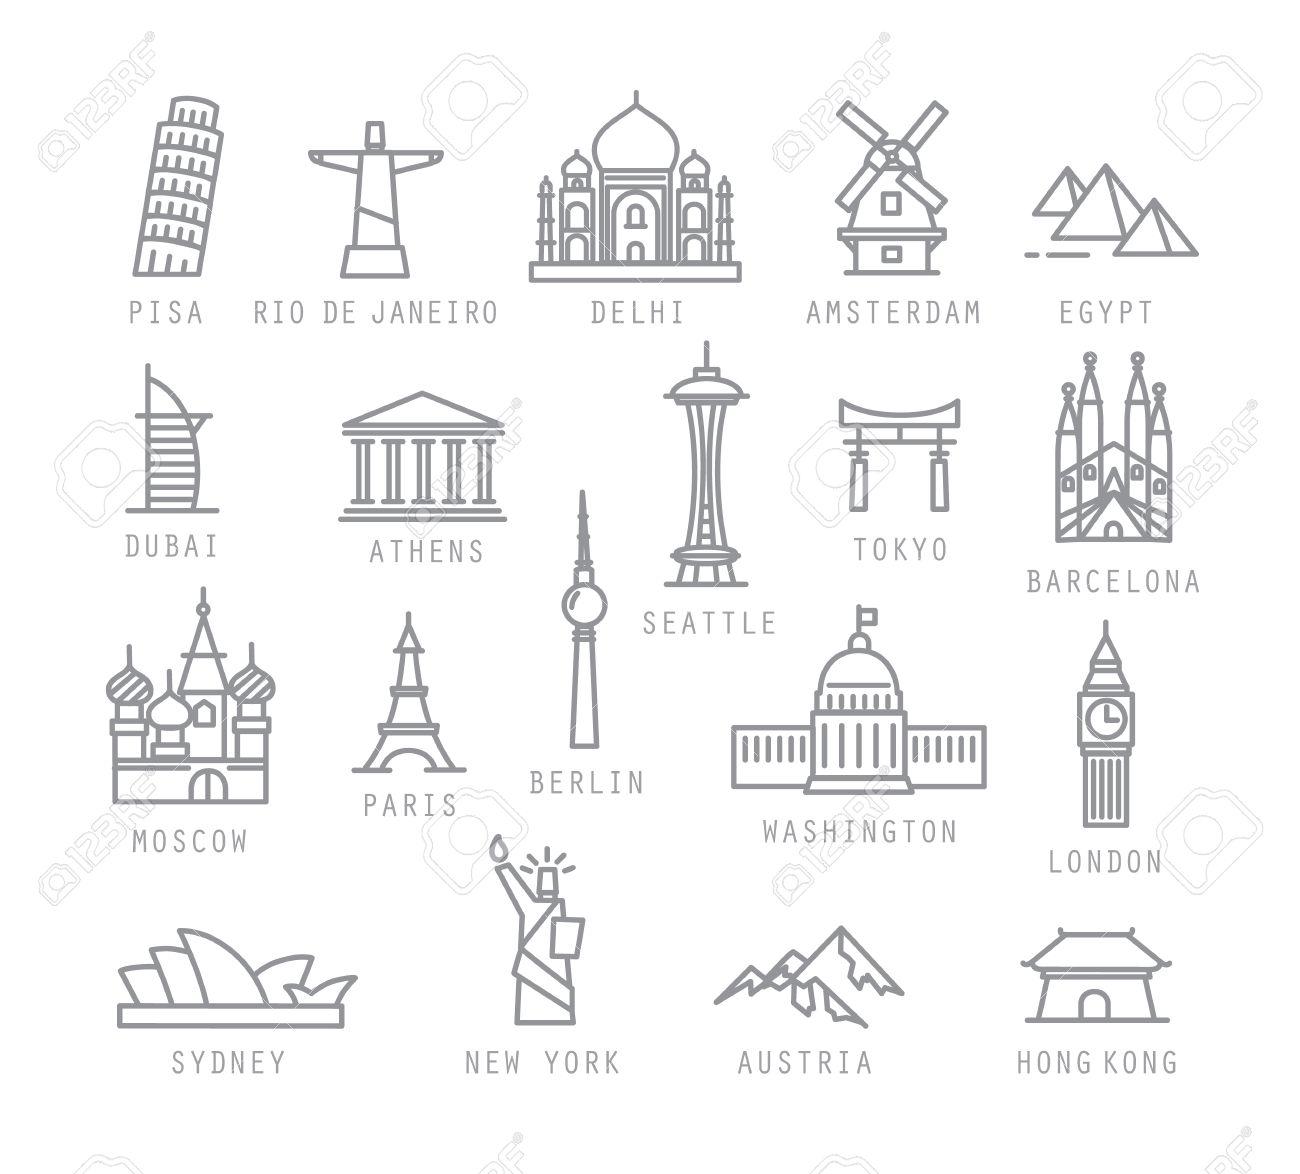 City icons in flat style with names Pisa, Rio, Delhi, Amsterdam, Dubai, Athens, Seattle, Tokyo, Barcelona, Berlin, Washington, Paris, London, Sydney, New York, Hong Kong - 48038968